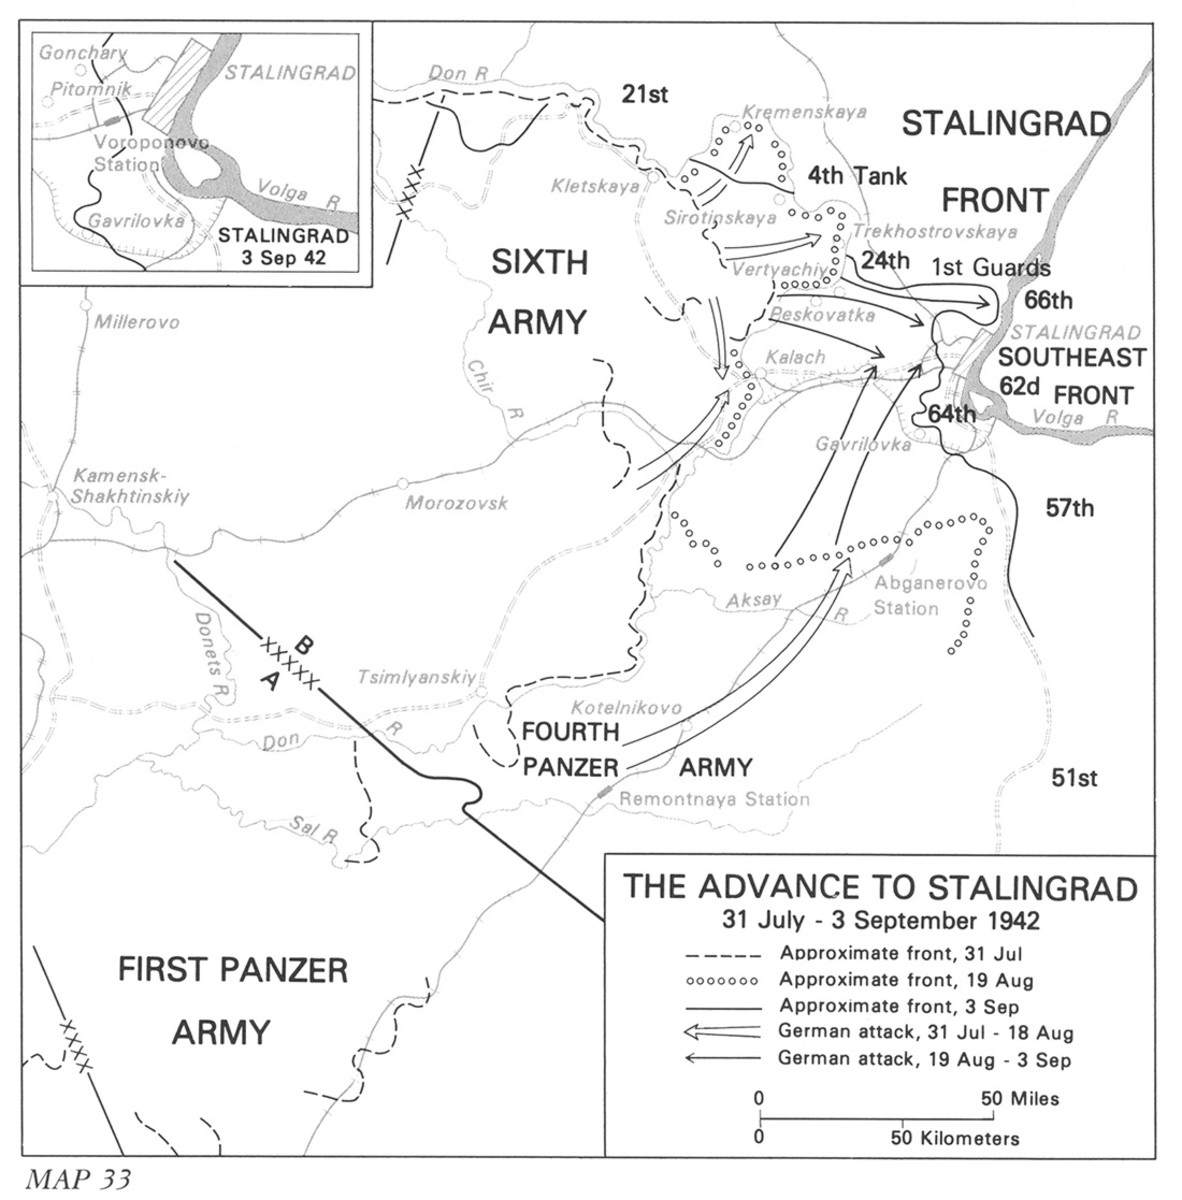 The German advance toward Stalingrad.